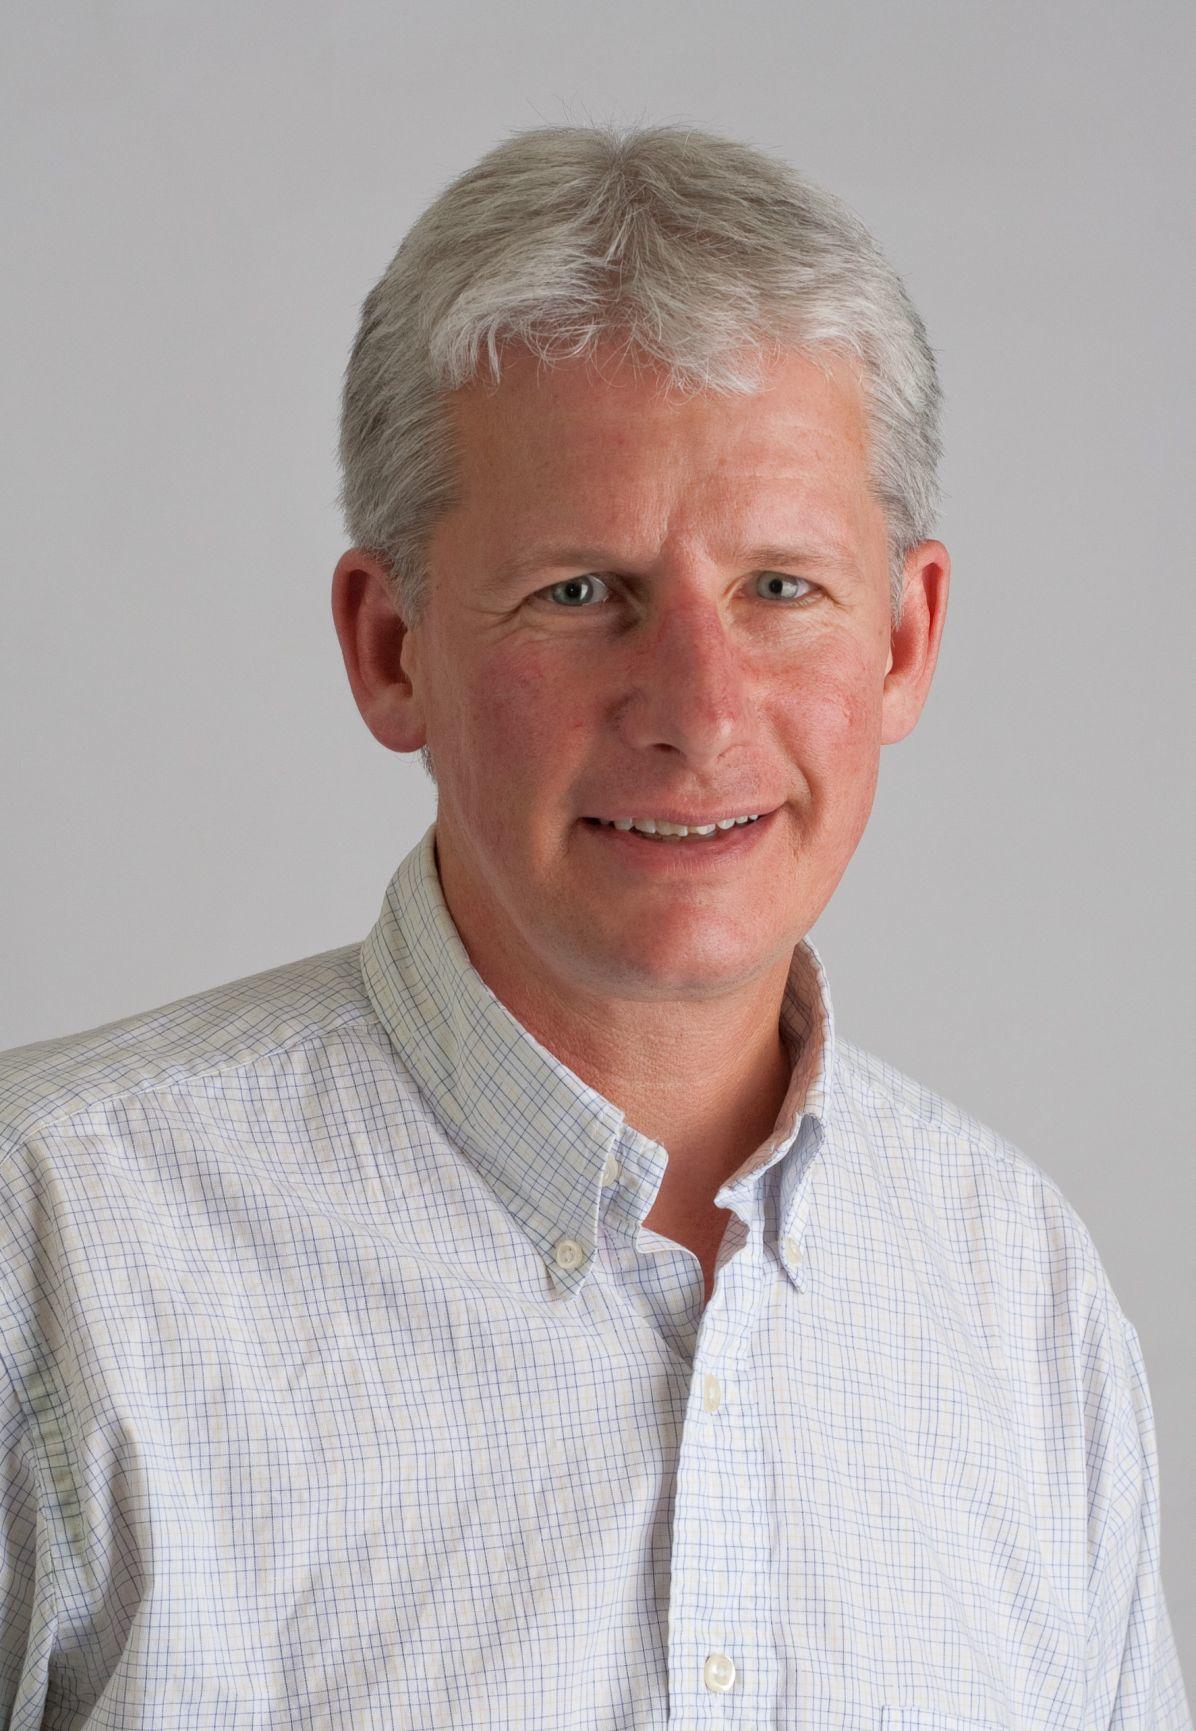 Dave Holm